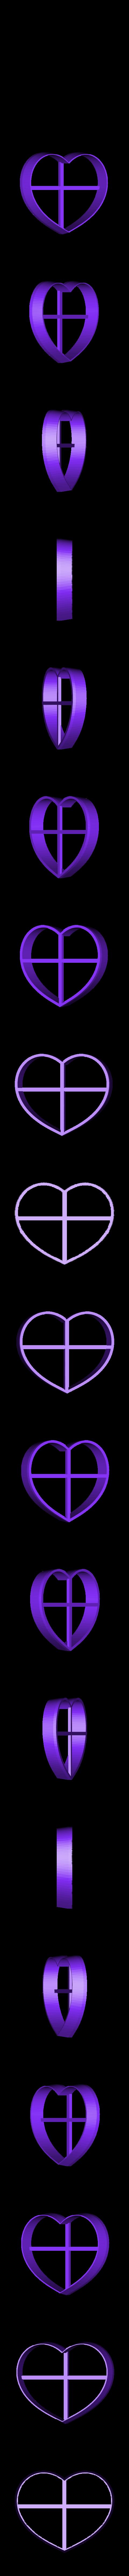 Heart.stl Download free STL file Set of simple Christmas cutters • 3D printer template, Ogubal3D